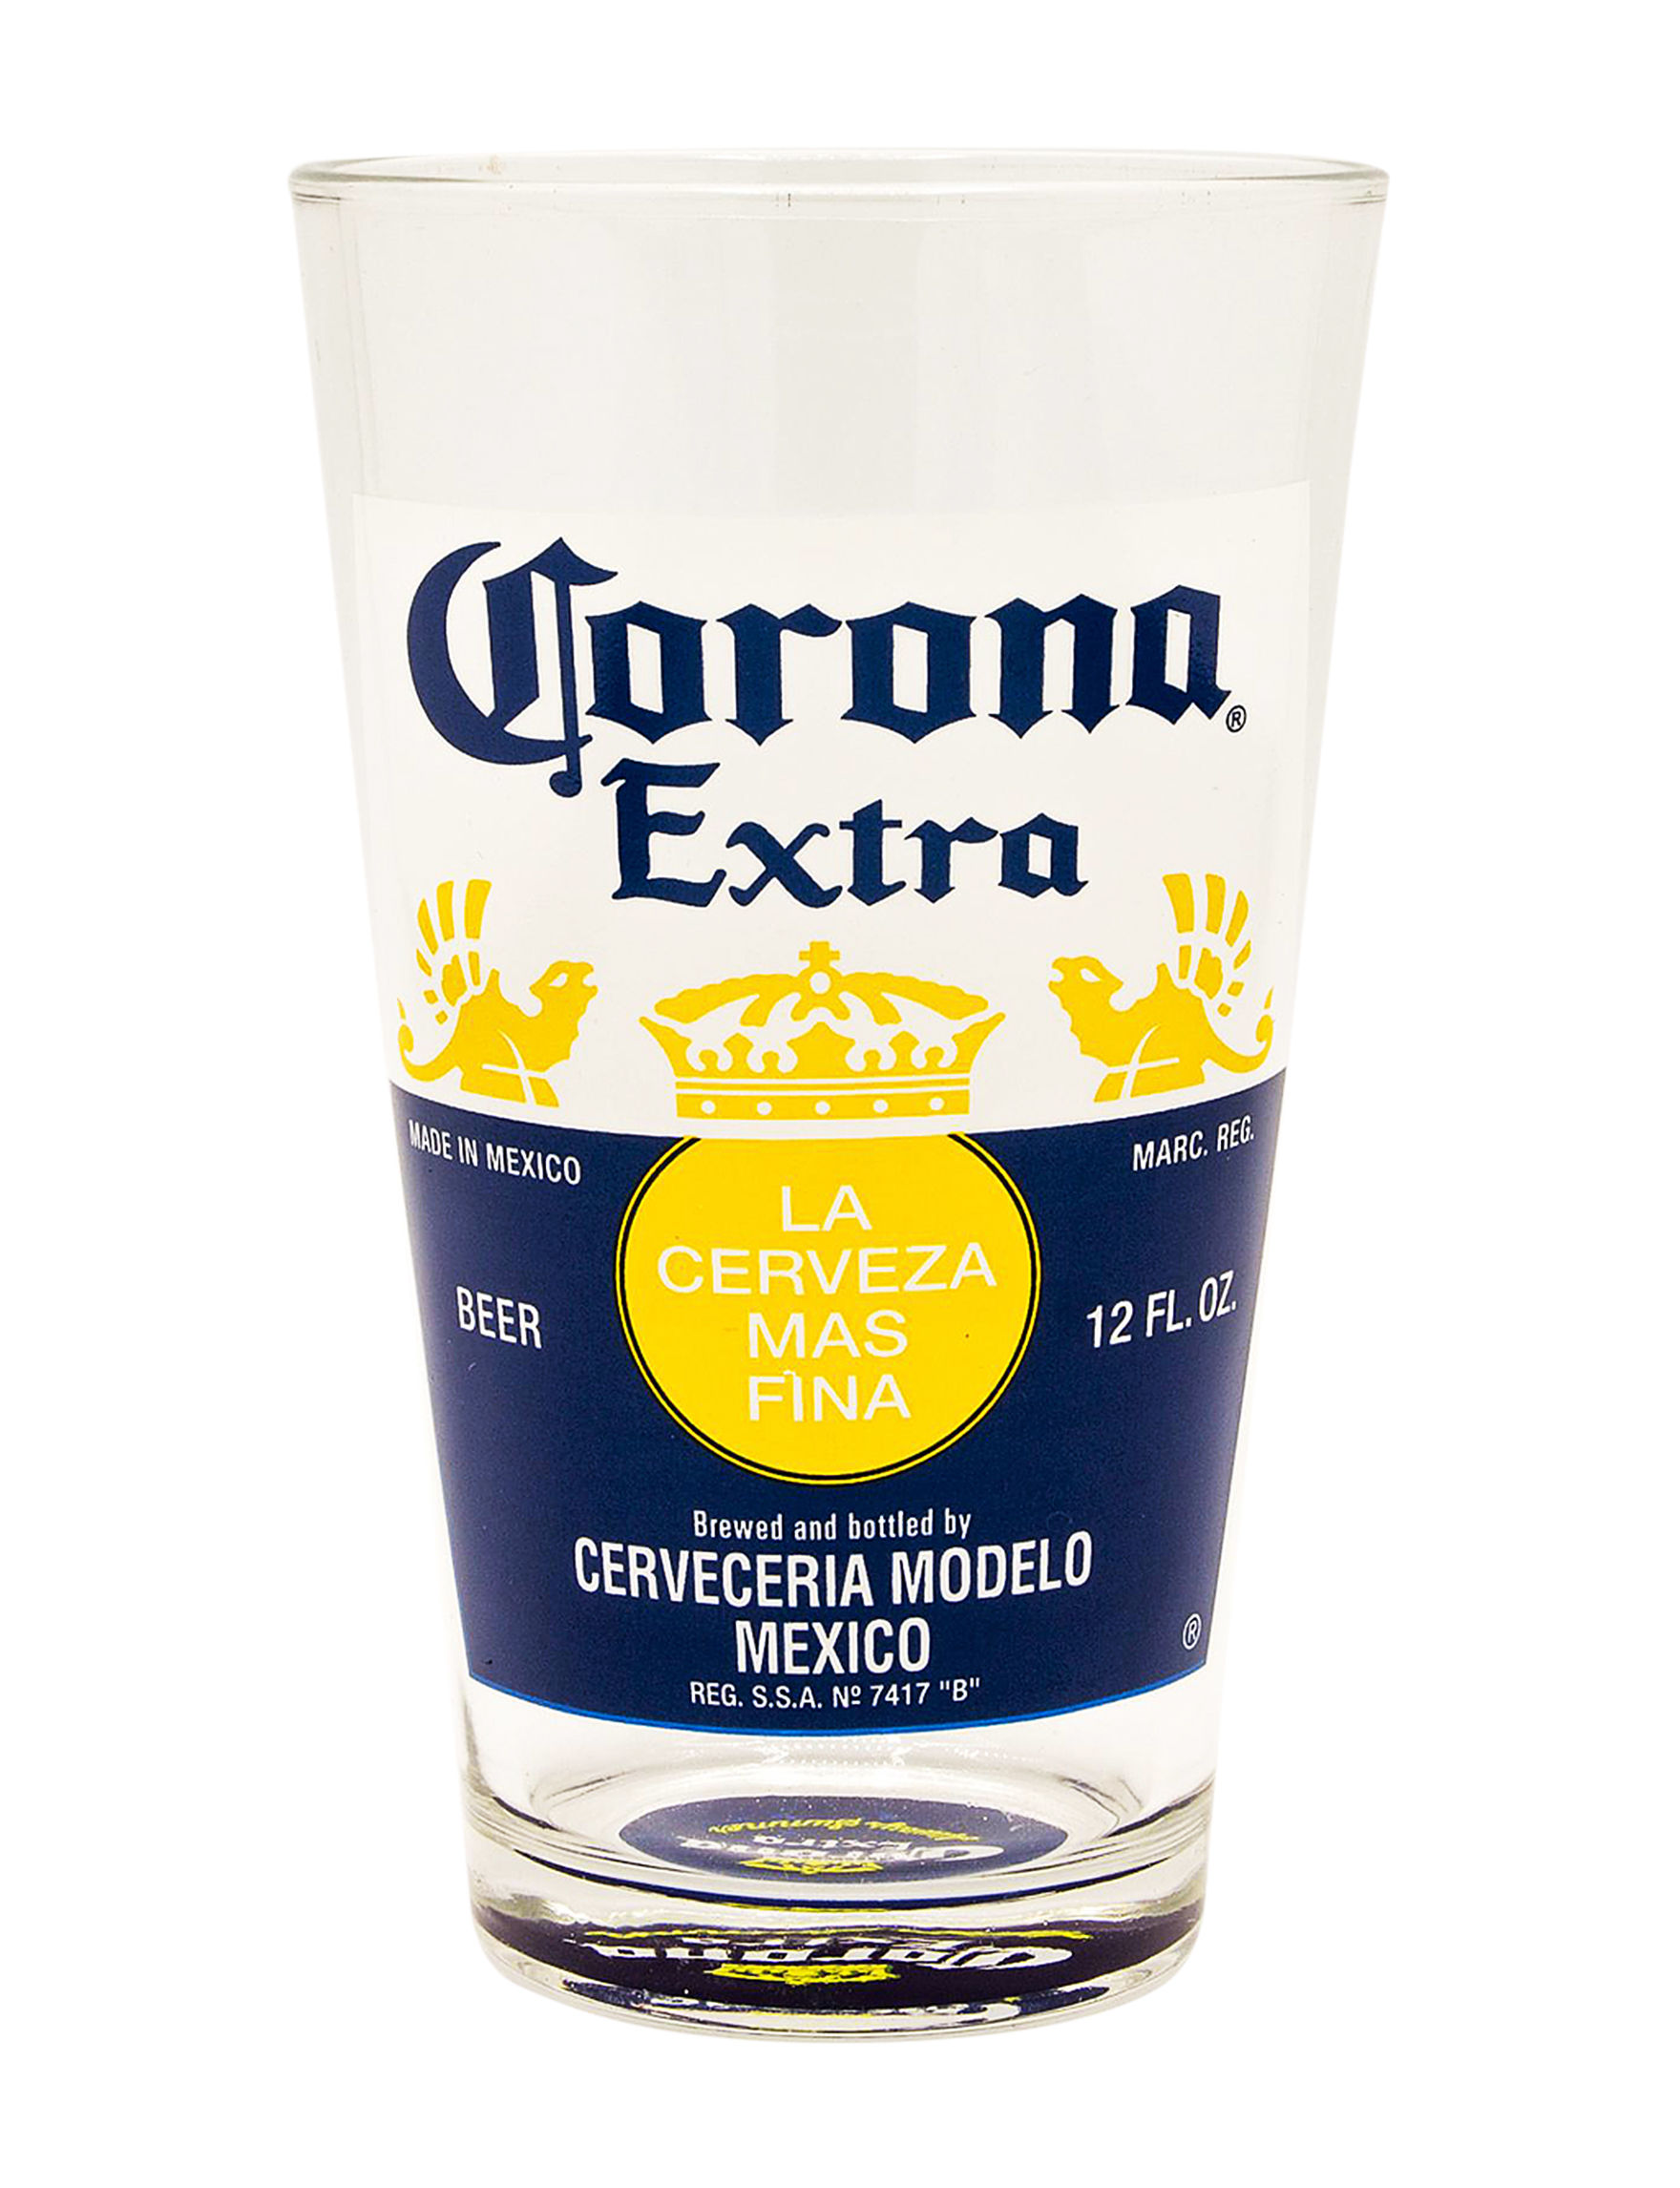 Corona Yellow / Navy Beer Glasses Drinkware Outdoor Entertaining